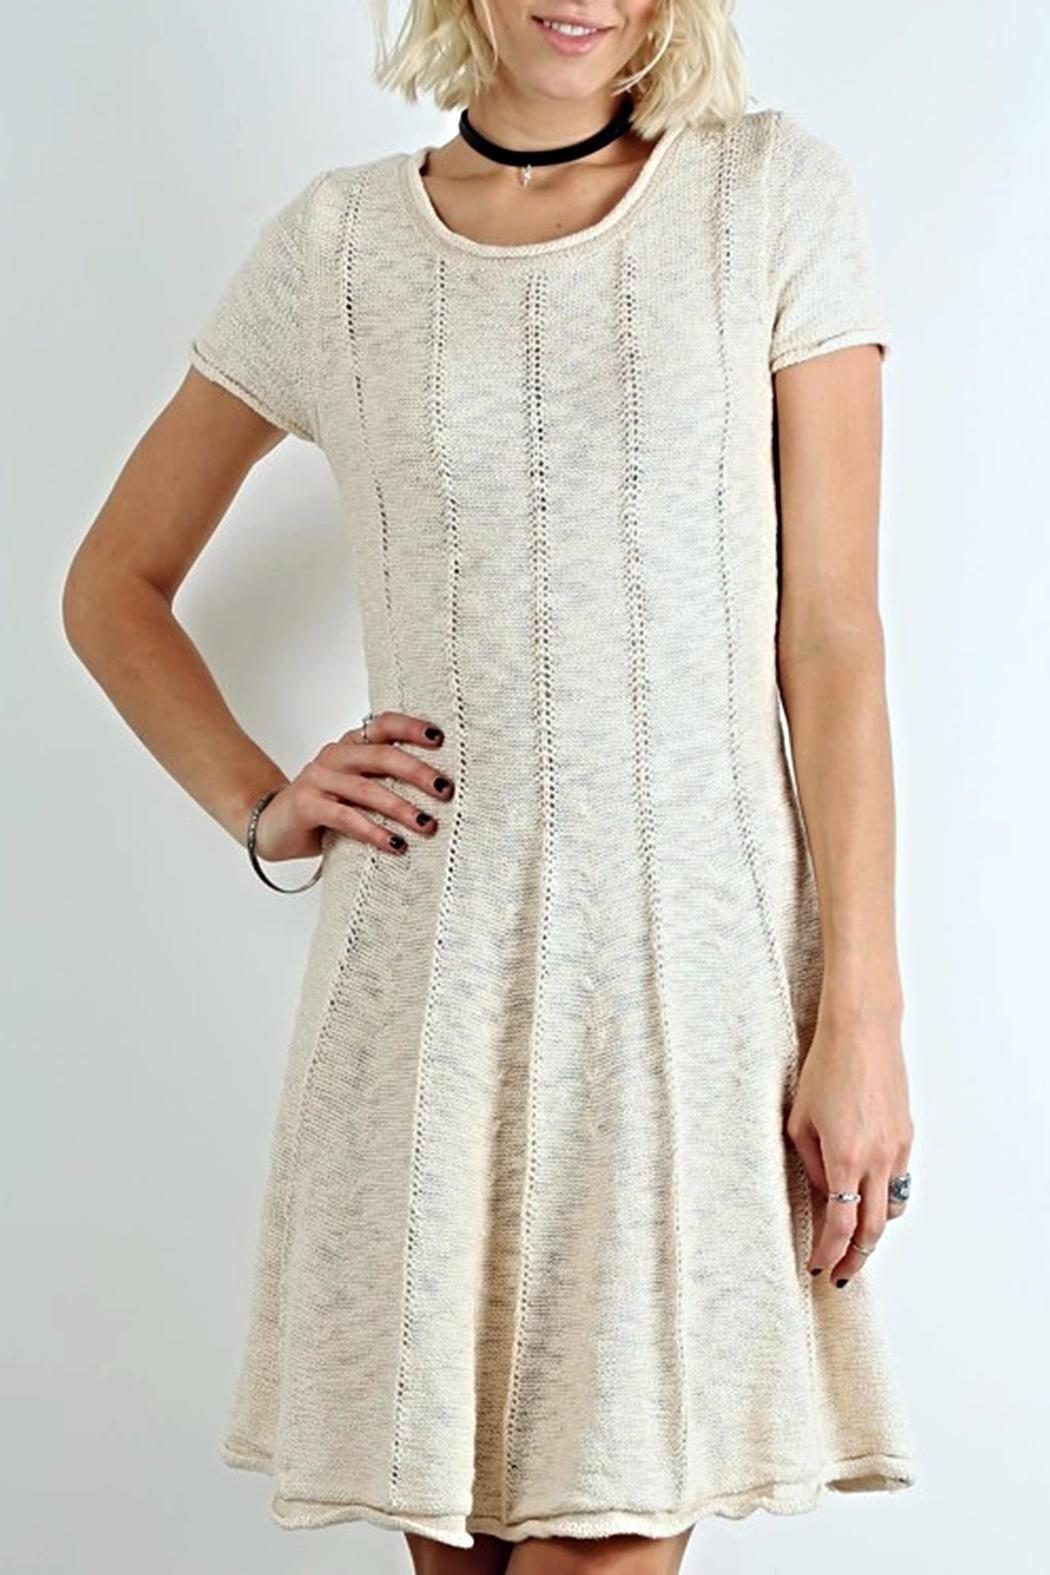 Lines Knit Dress Short Sleeve Dresses Knit Dress Dresses [ 1575 x 1050 Pixel ]